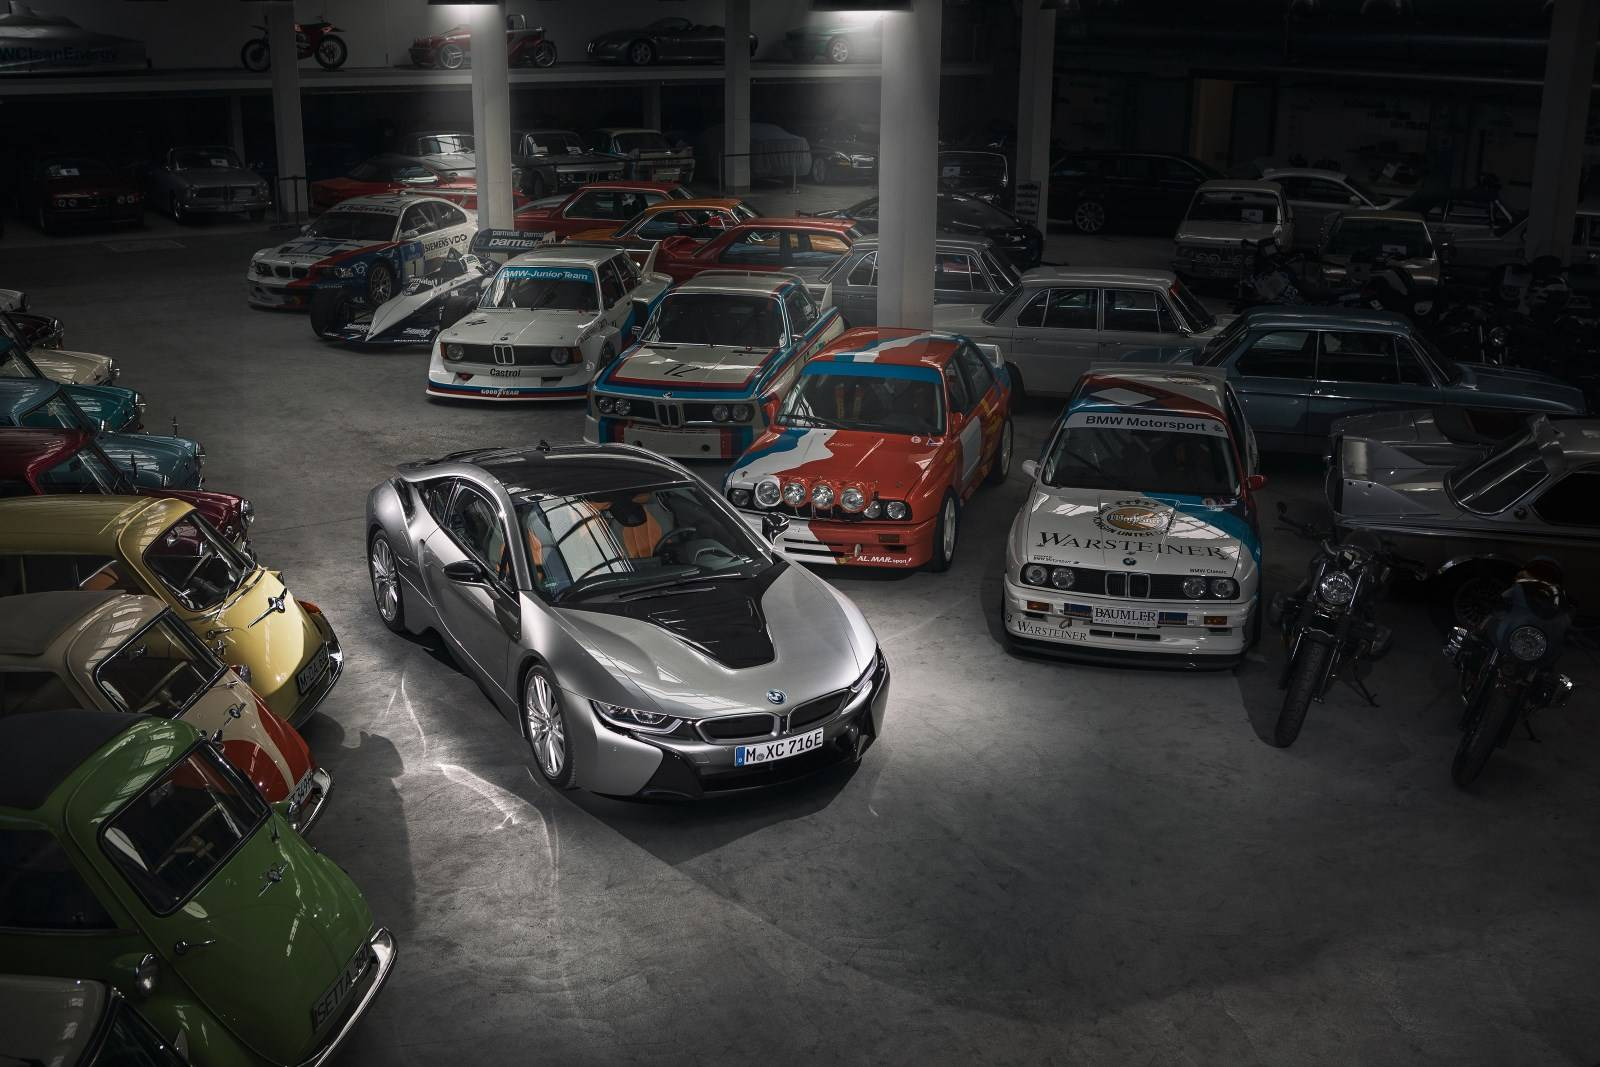 BMW закрыл музеи из-за коронавируса 2